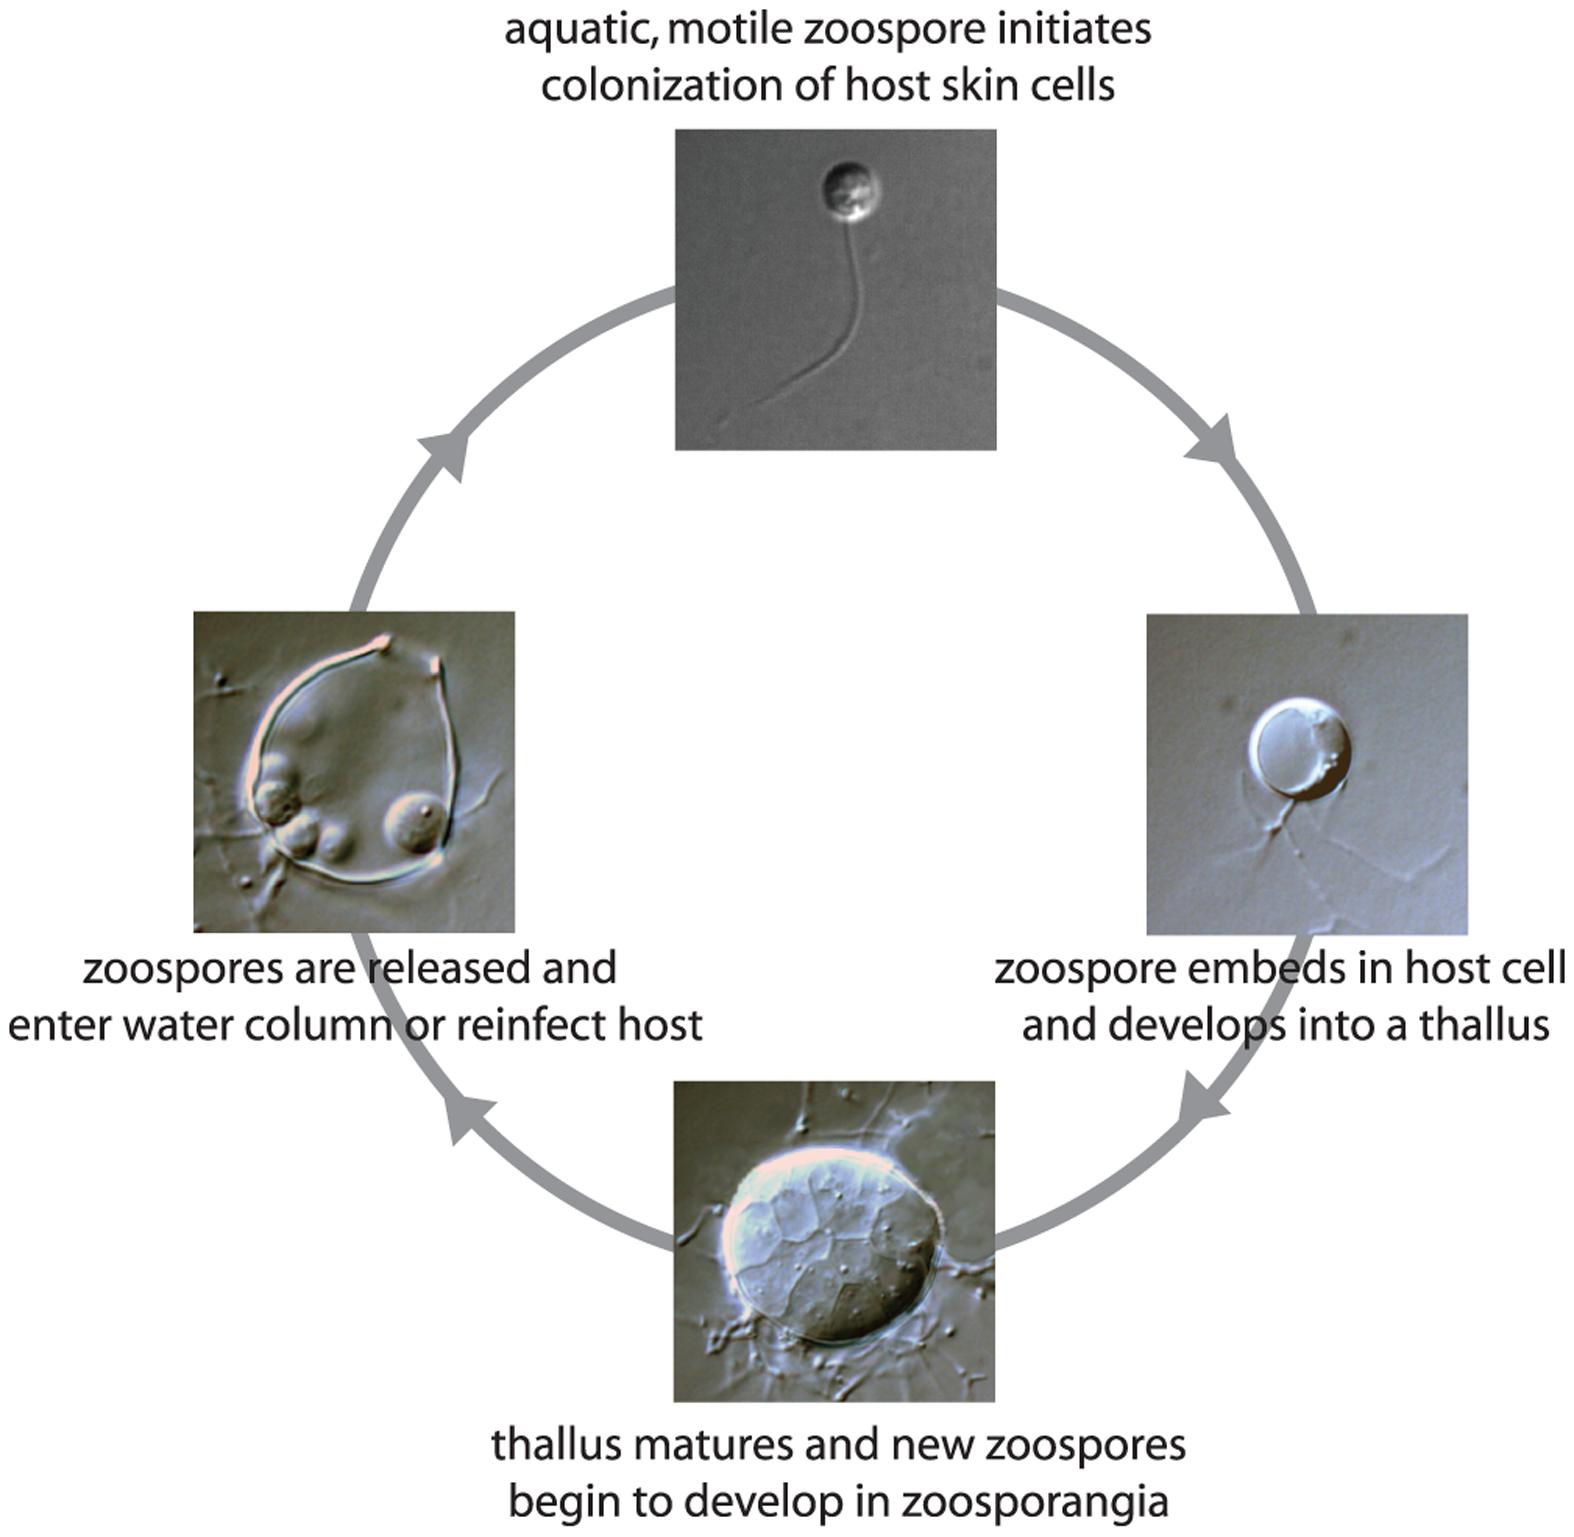 Life cycle of the pathogenic chytrid fungus <i>Batrachochytrium dendrobatidis</i>.